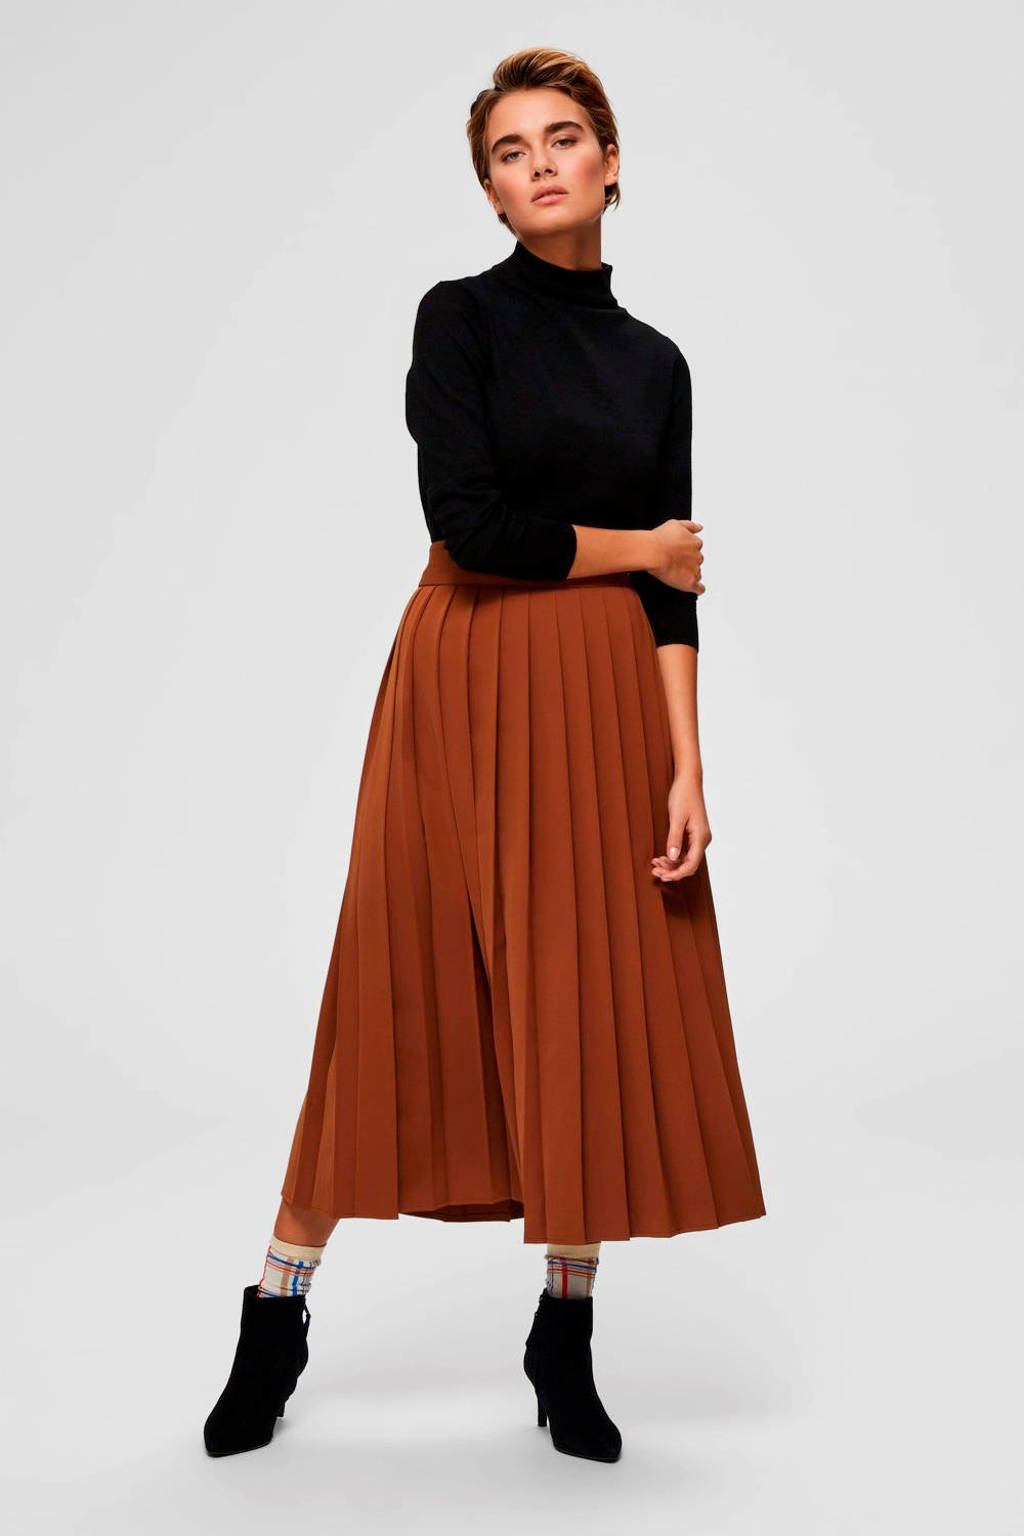 SELECTED FEMME plissé rok bruin, Bruin